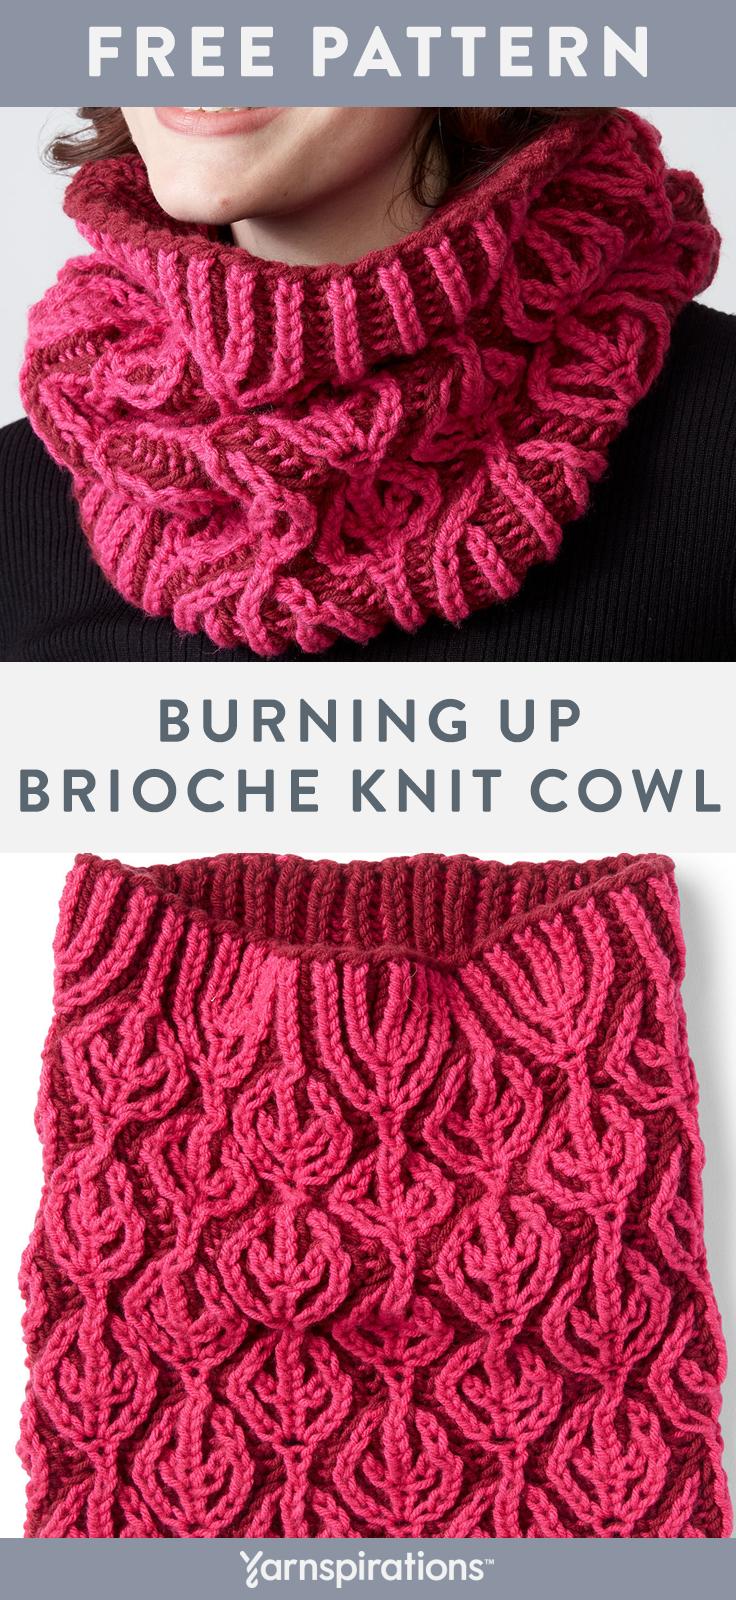 Caron Burning Up Crioche Knit Cowl Burning Caron Cowl Crioche Knit In 2020 Brioche Knitting Patterns Colorwork Knitting Colorwork Knitting Patterns